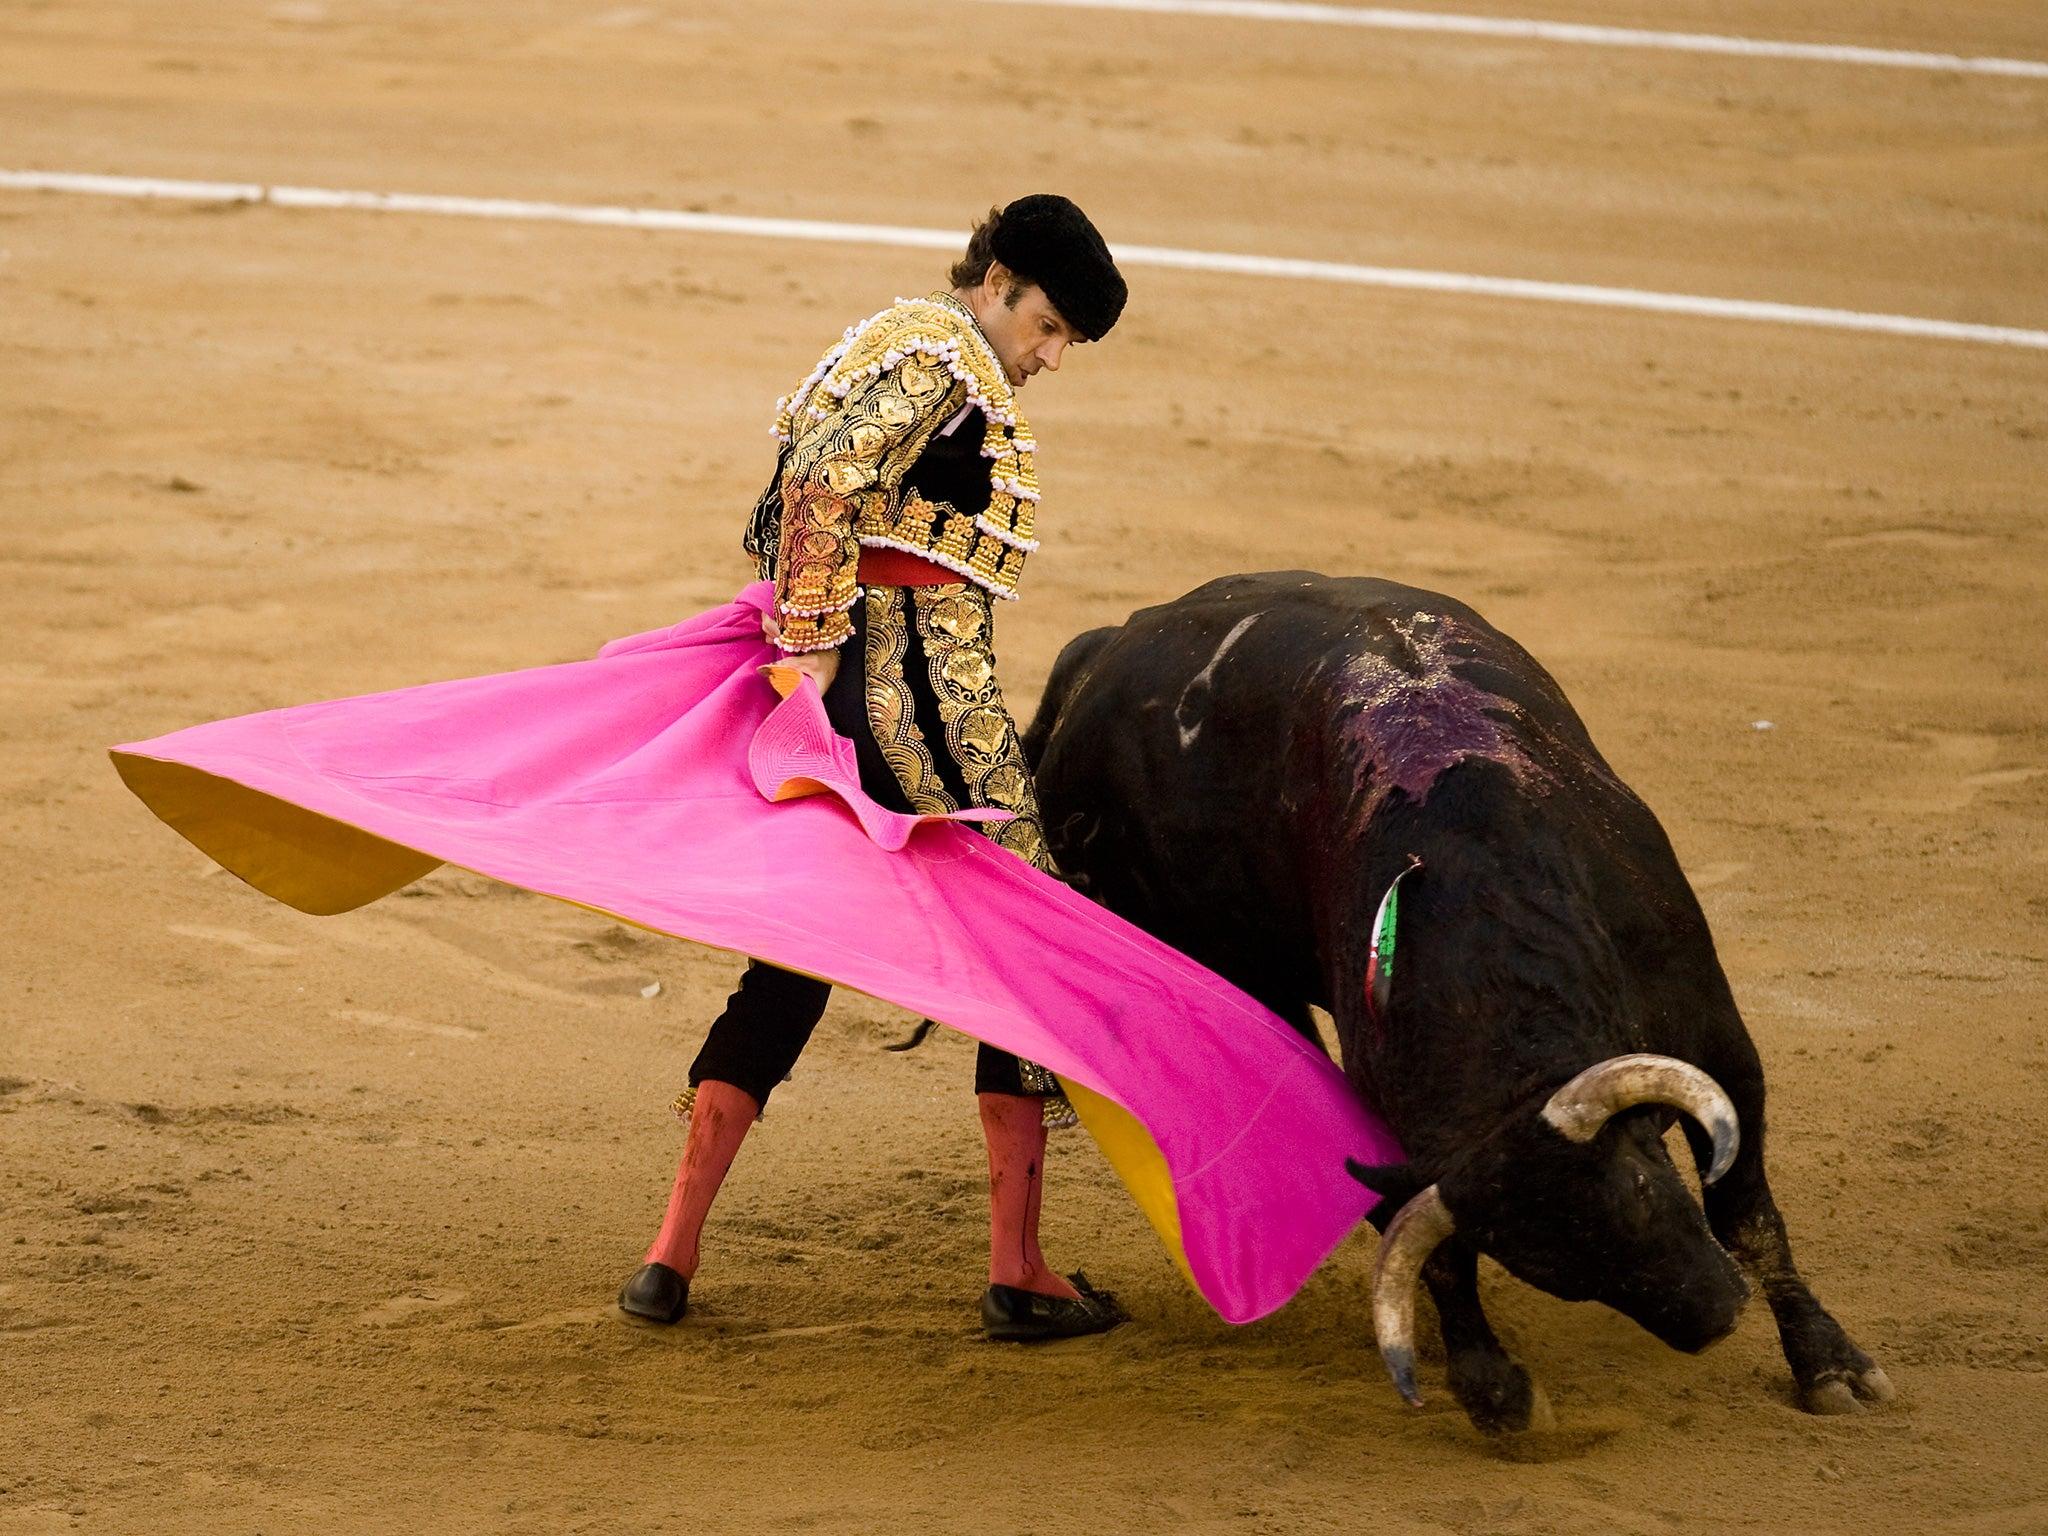 Bullfighting Gone Wrong HD Wallpaper Background